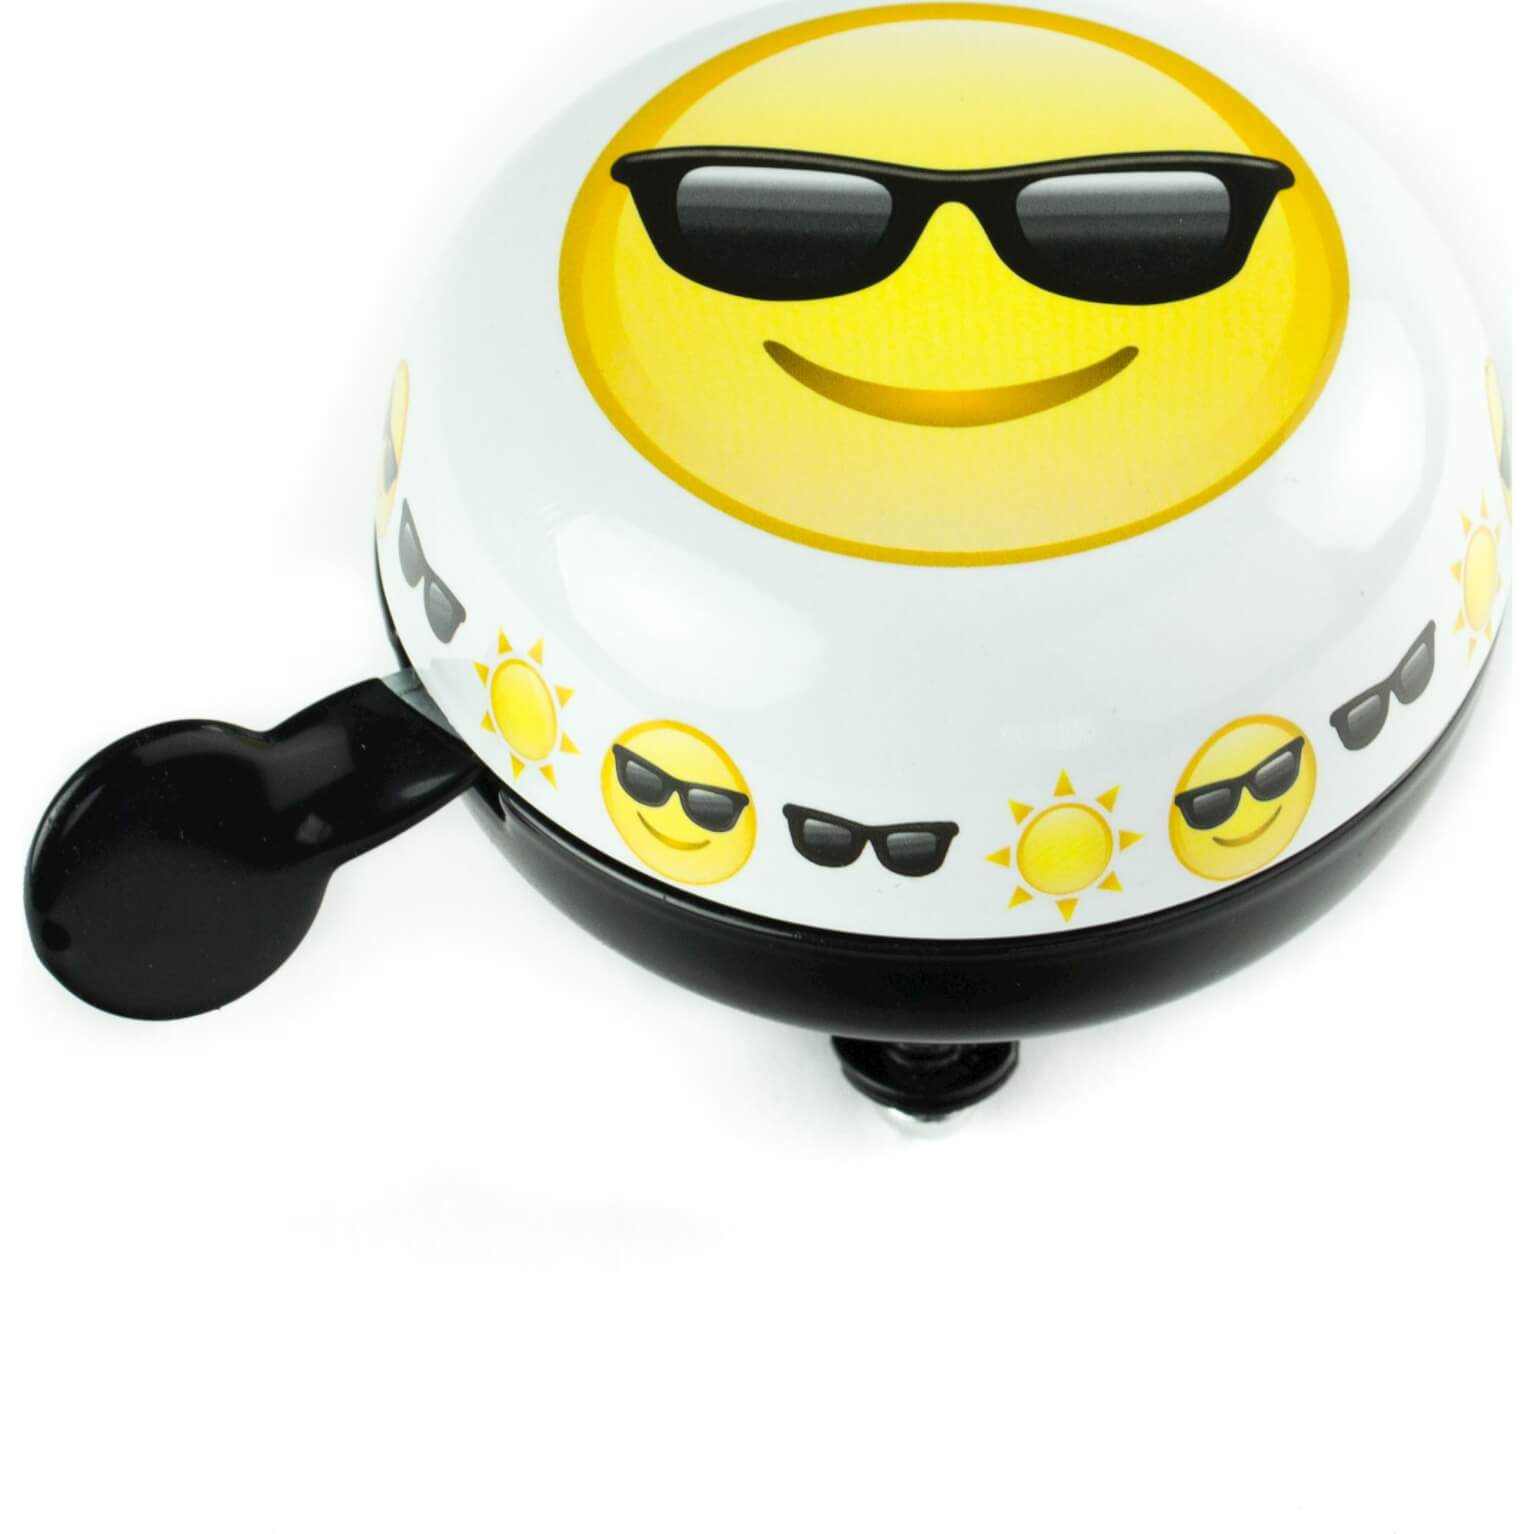 Widek bel Ding Dong Emoticon sunglas krt